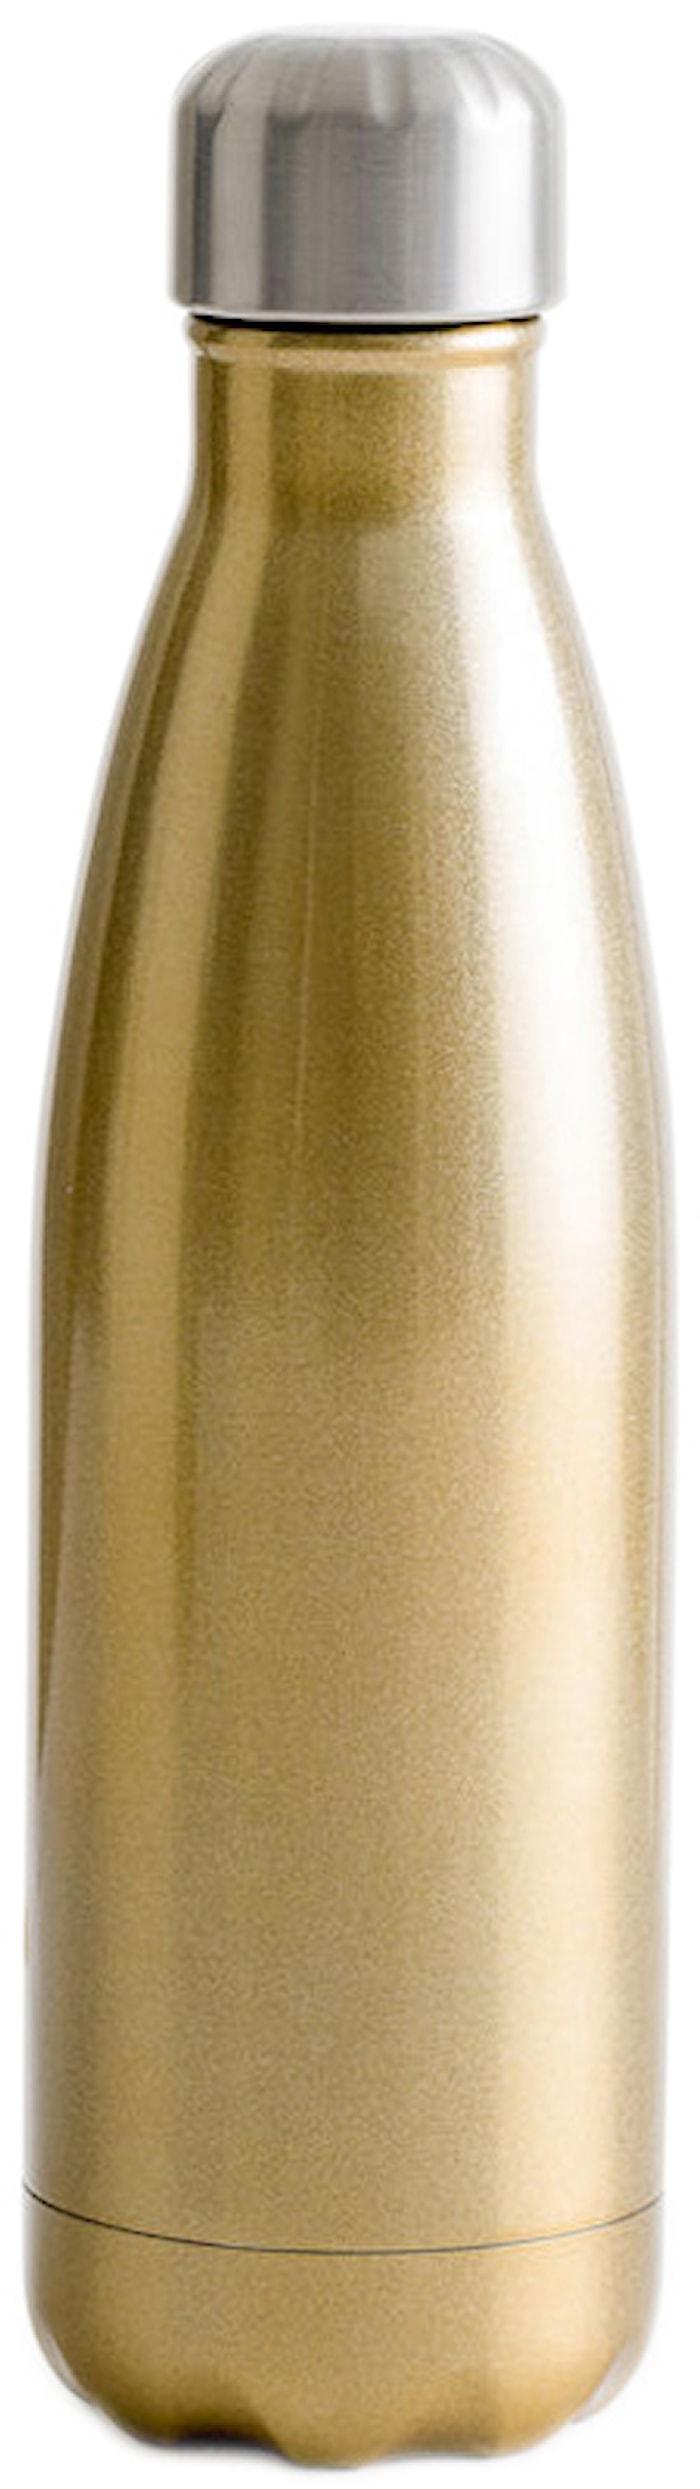 Stålflaske guld